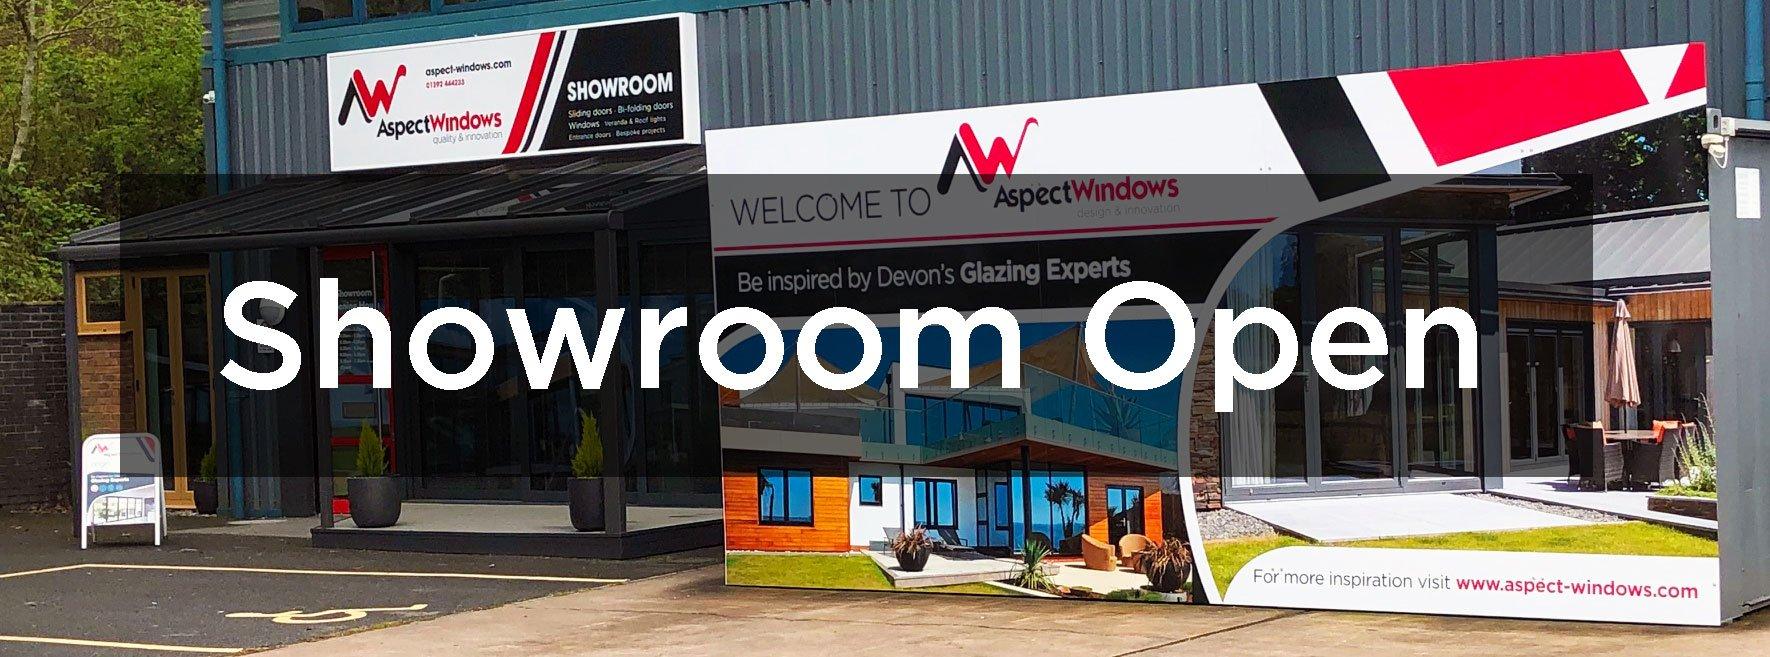 Aspect Windows showroom open